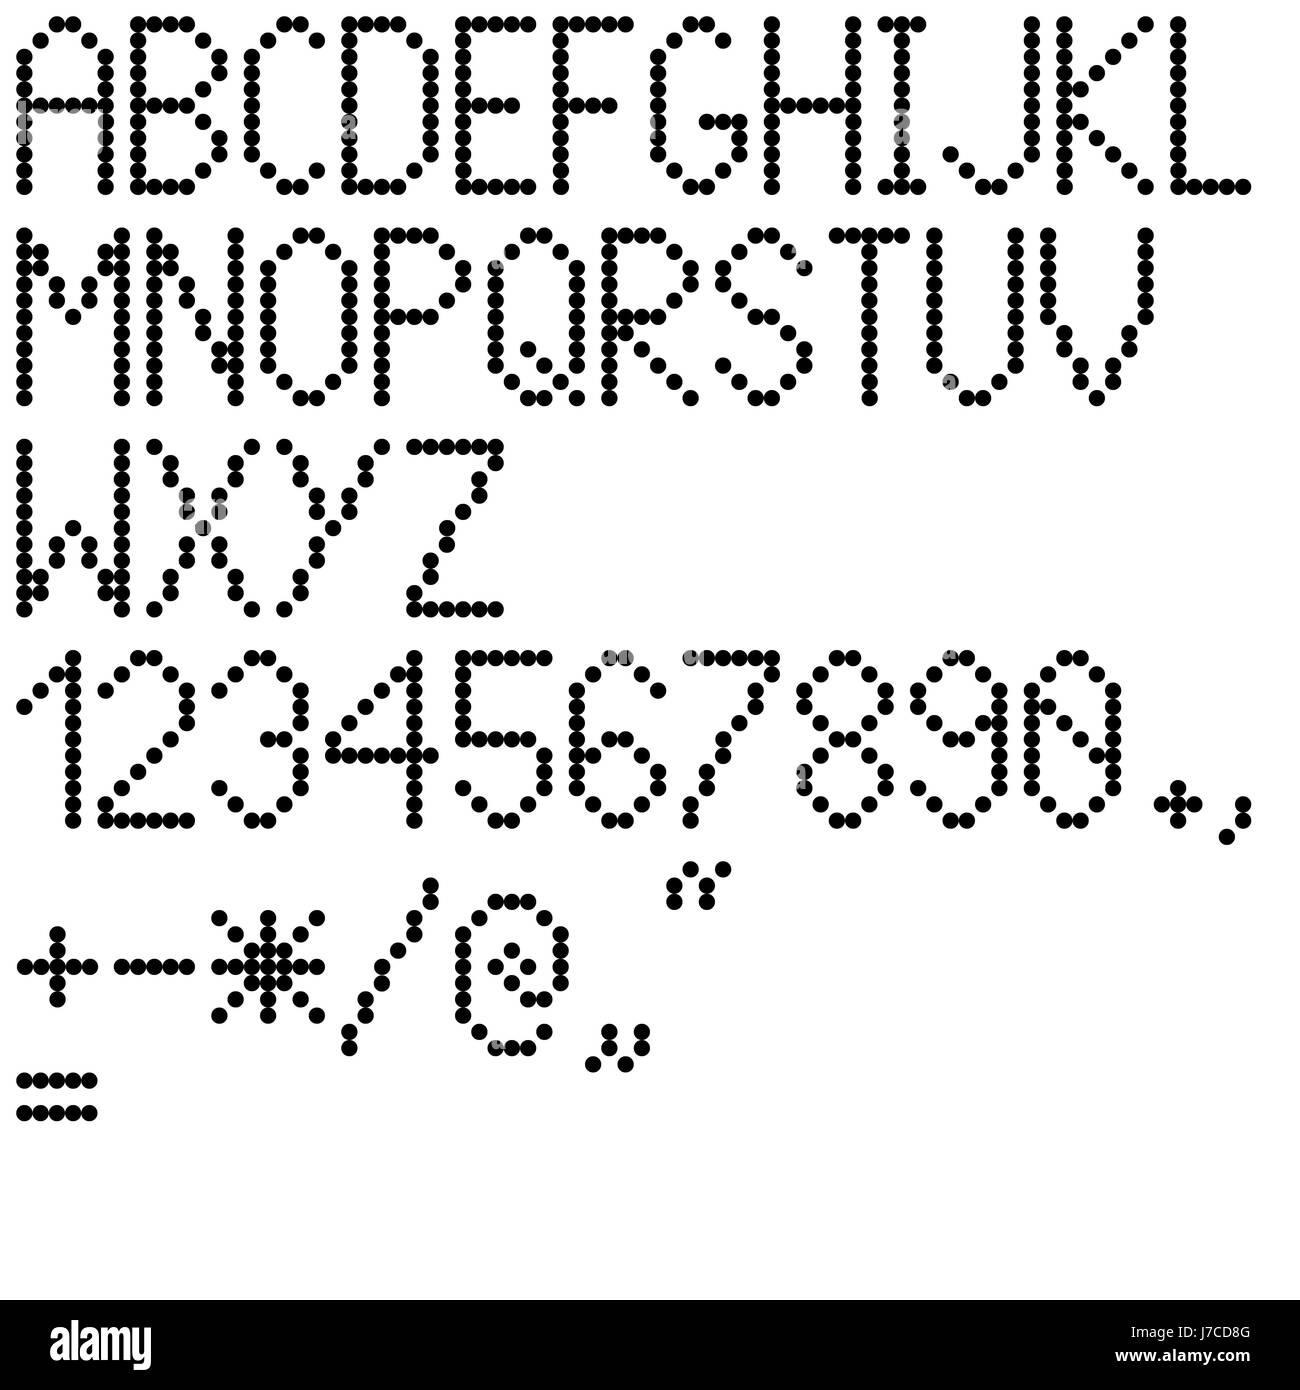 Sign Signal Letters Symbols Numerics Count Alphabet Abc Numbers Dots